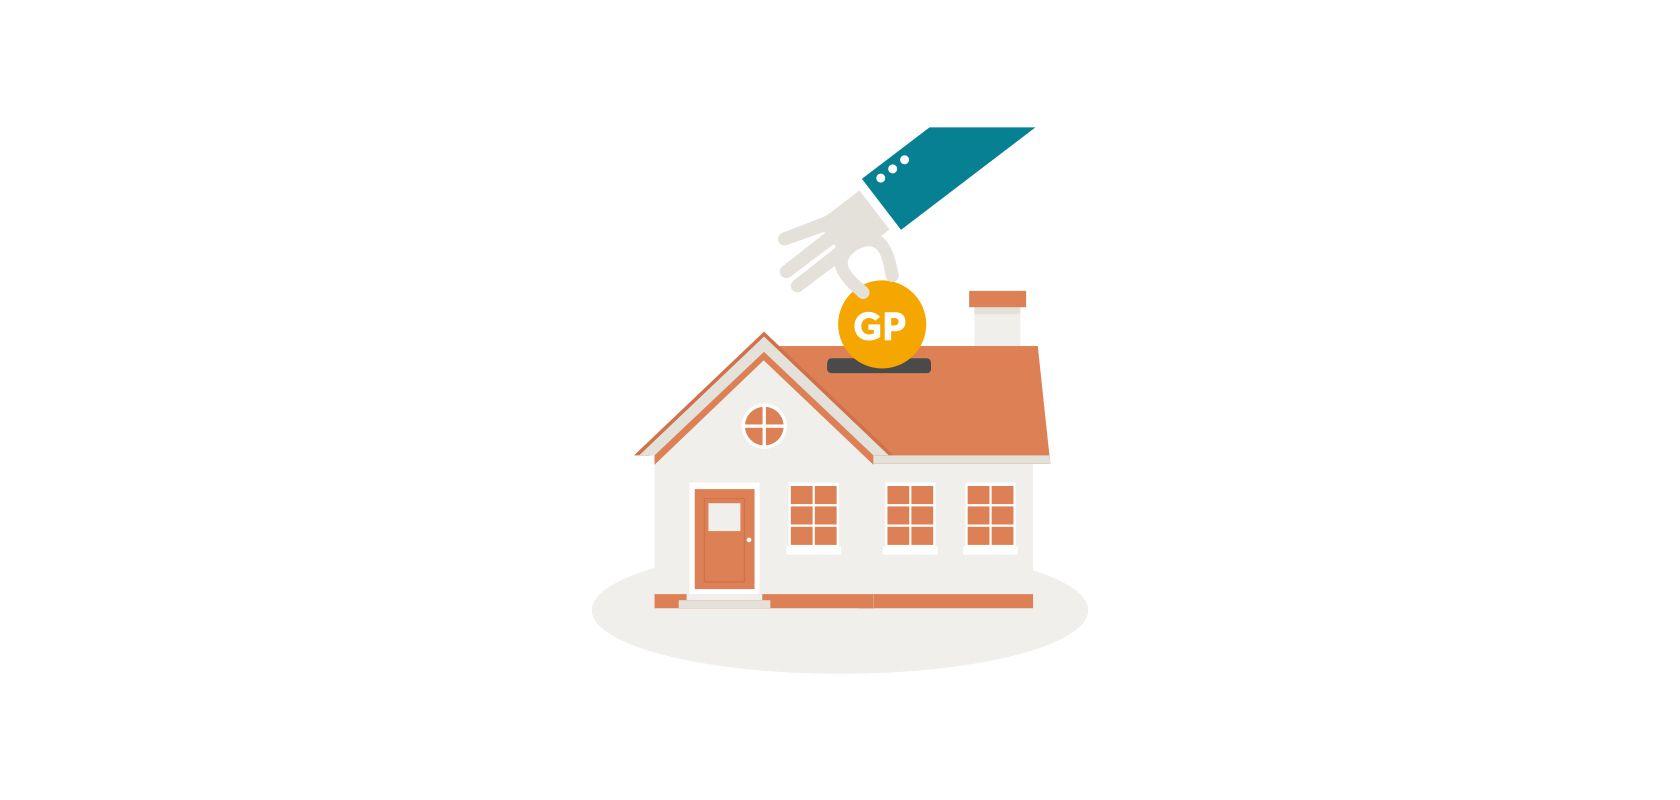 Alt casa_guestpoints_homeexchange, title casa_guestpoints_homeexchange